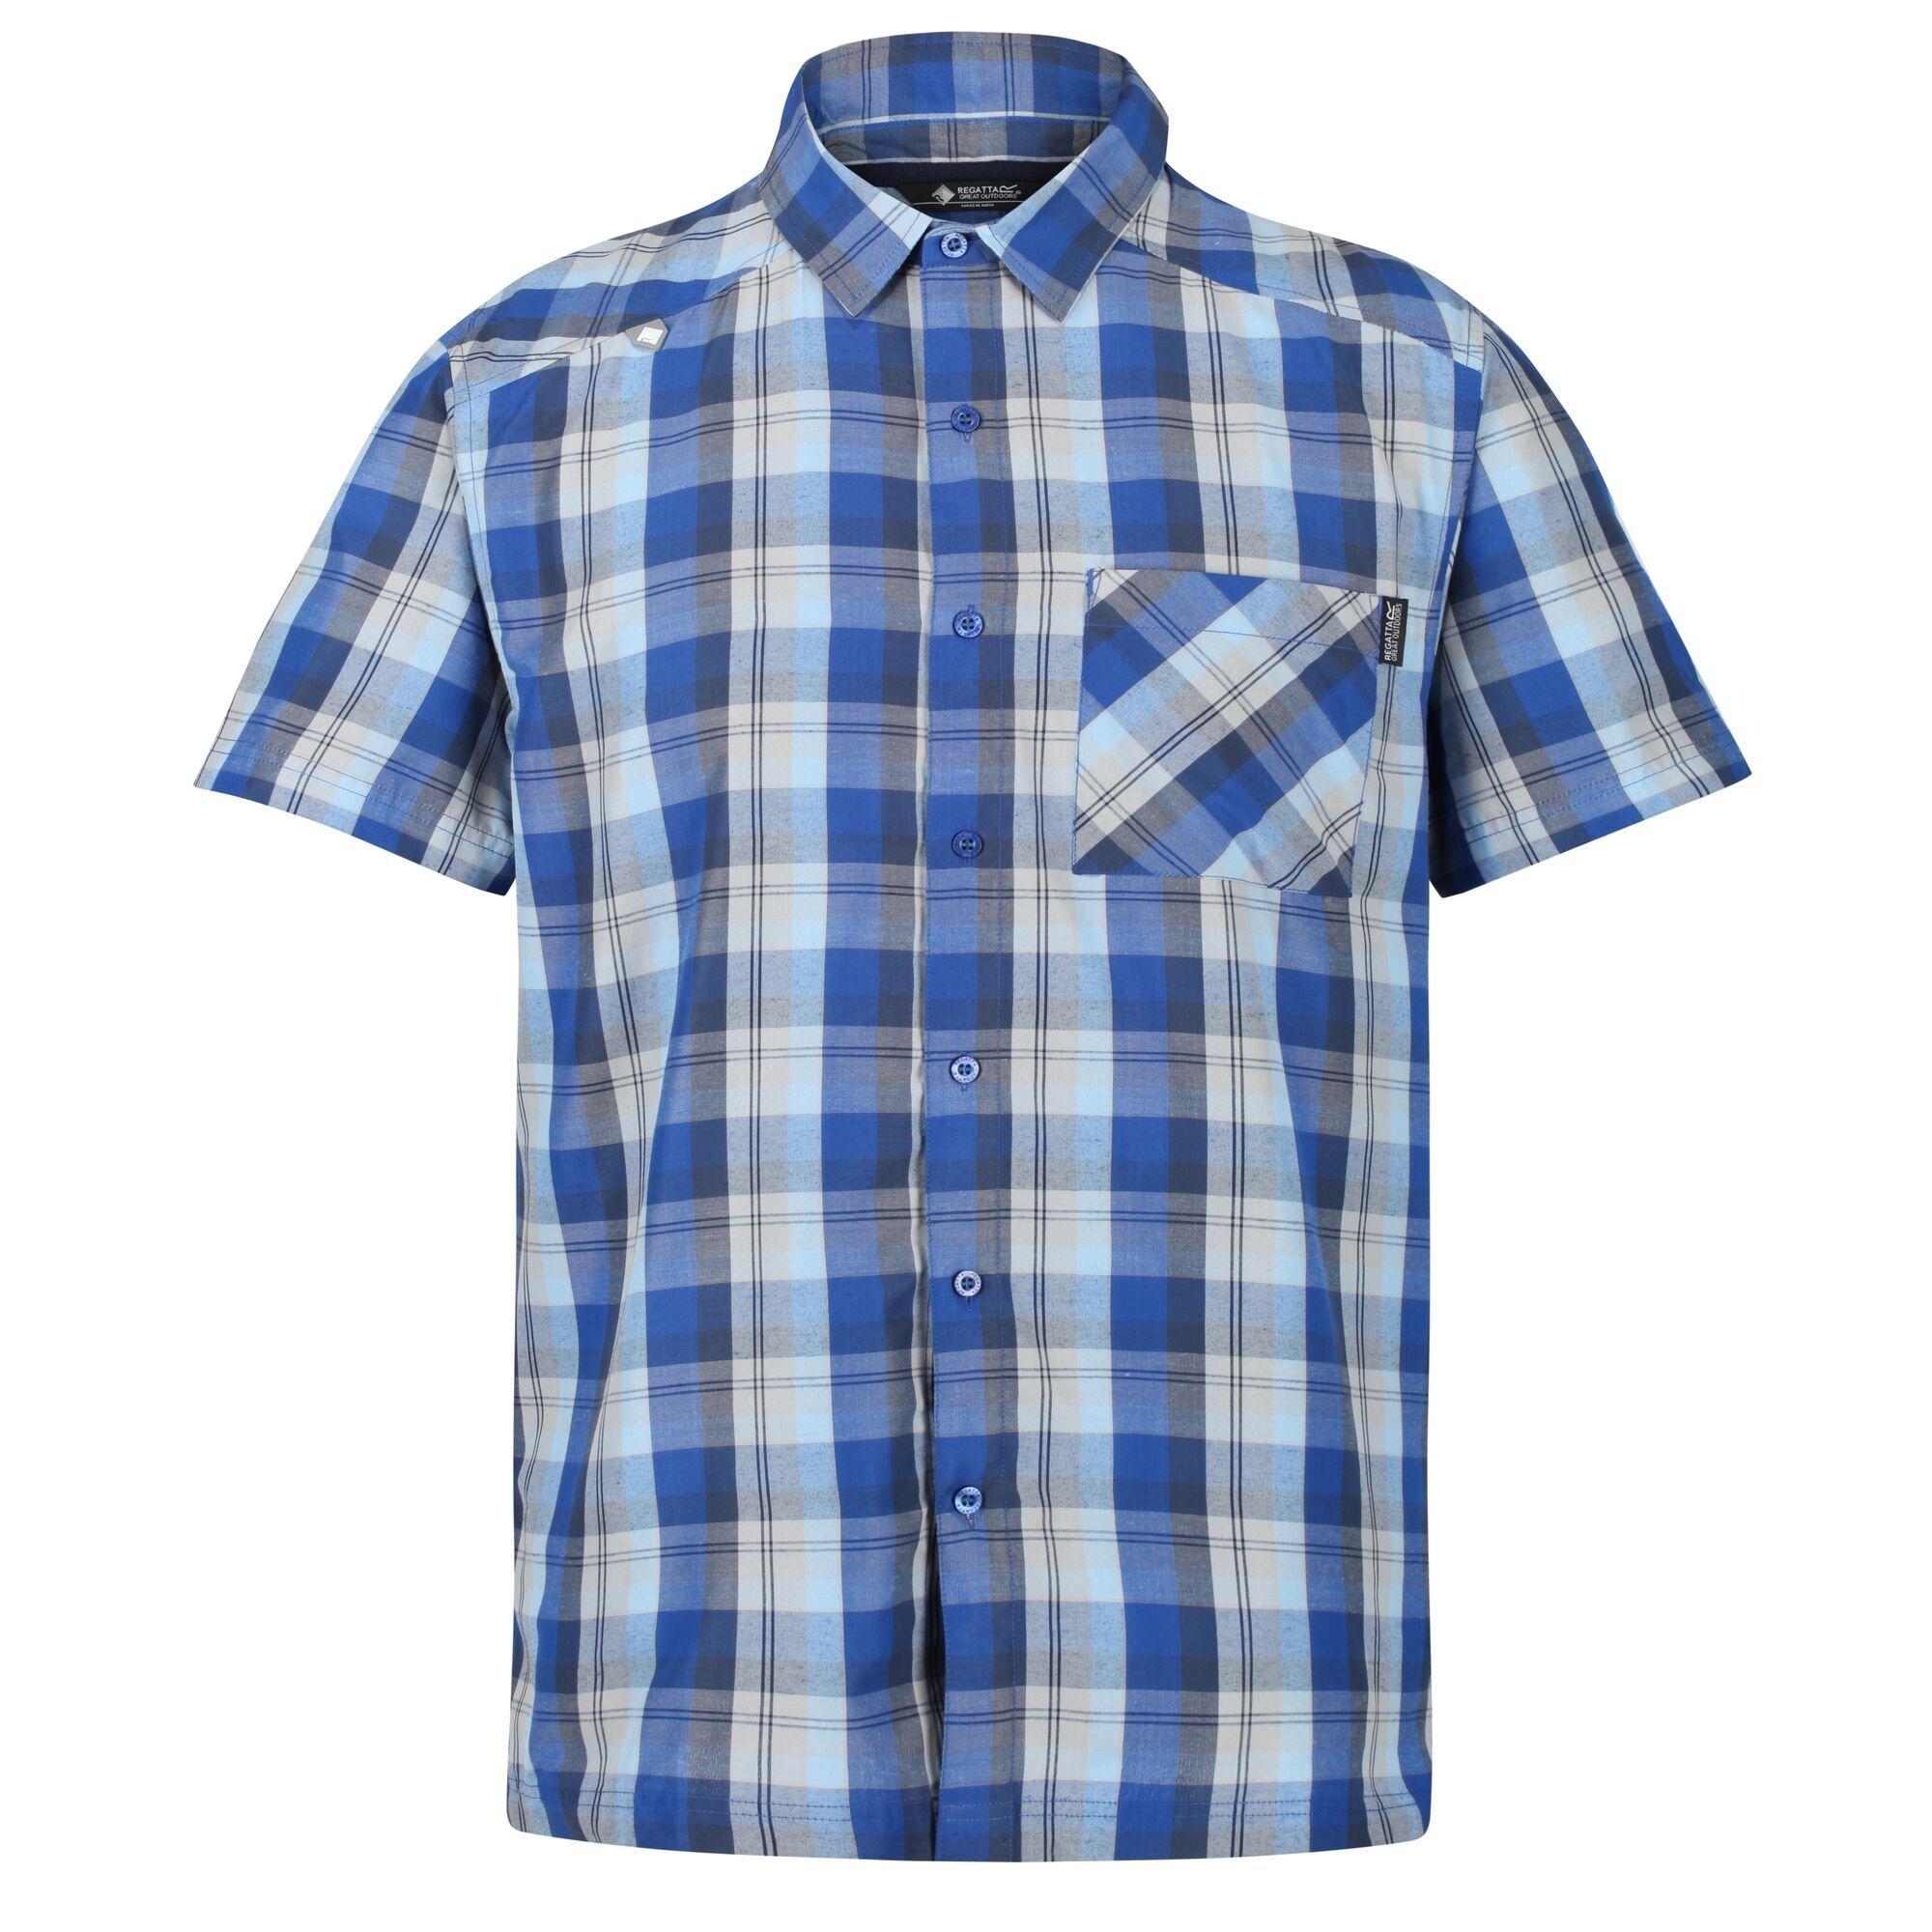 Regatta Mens Kalambo V Short Sleeved Checked Shirt